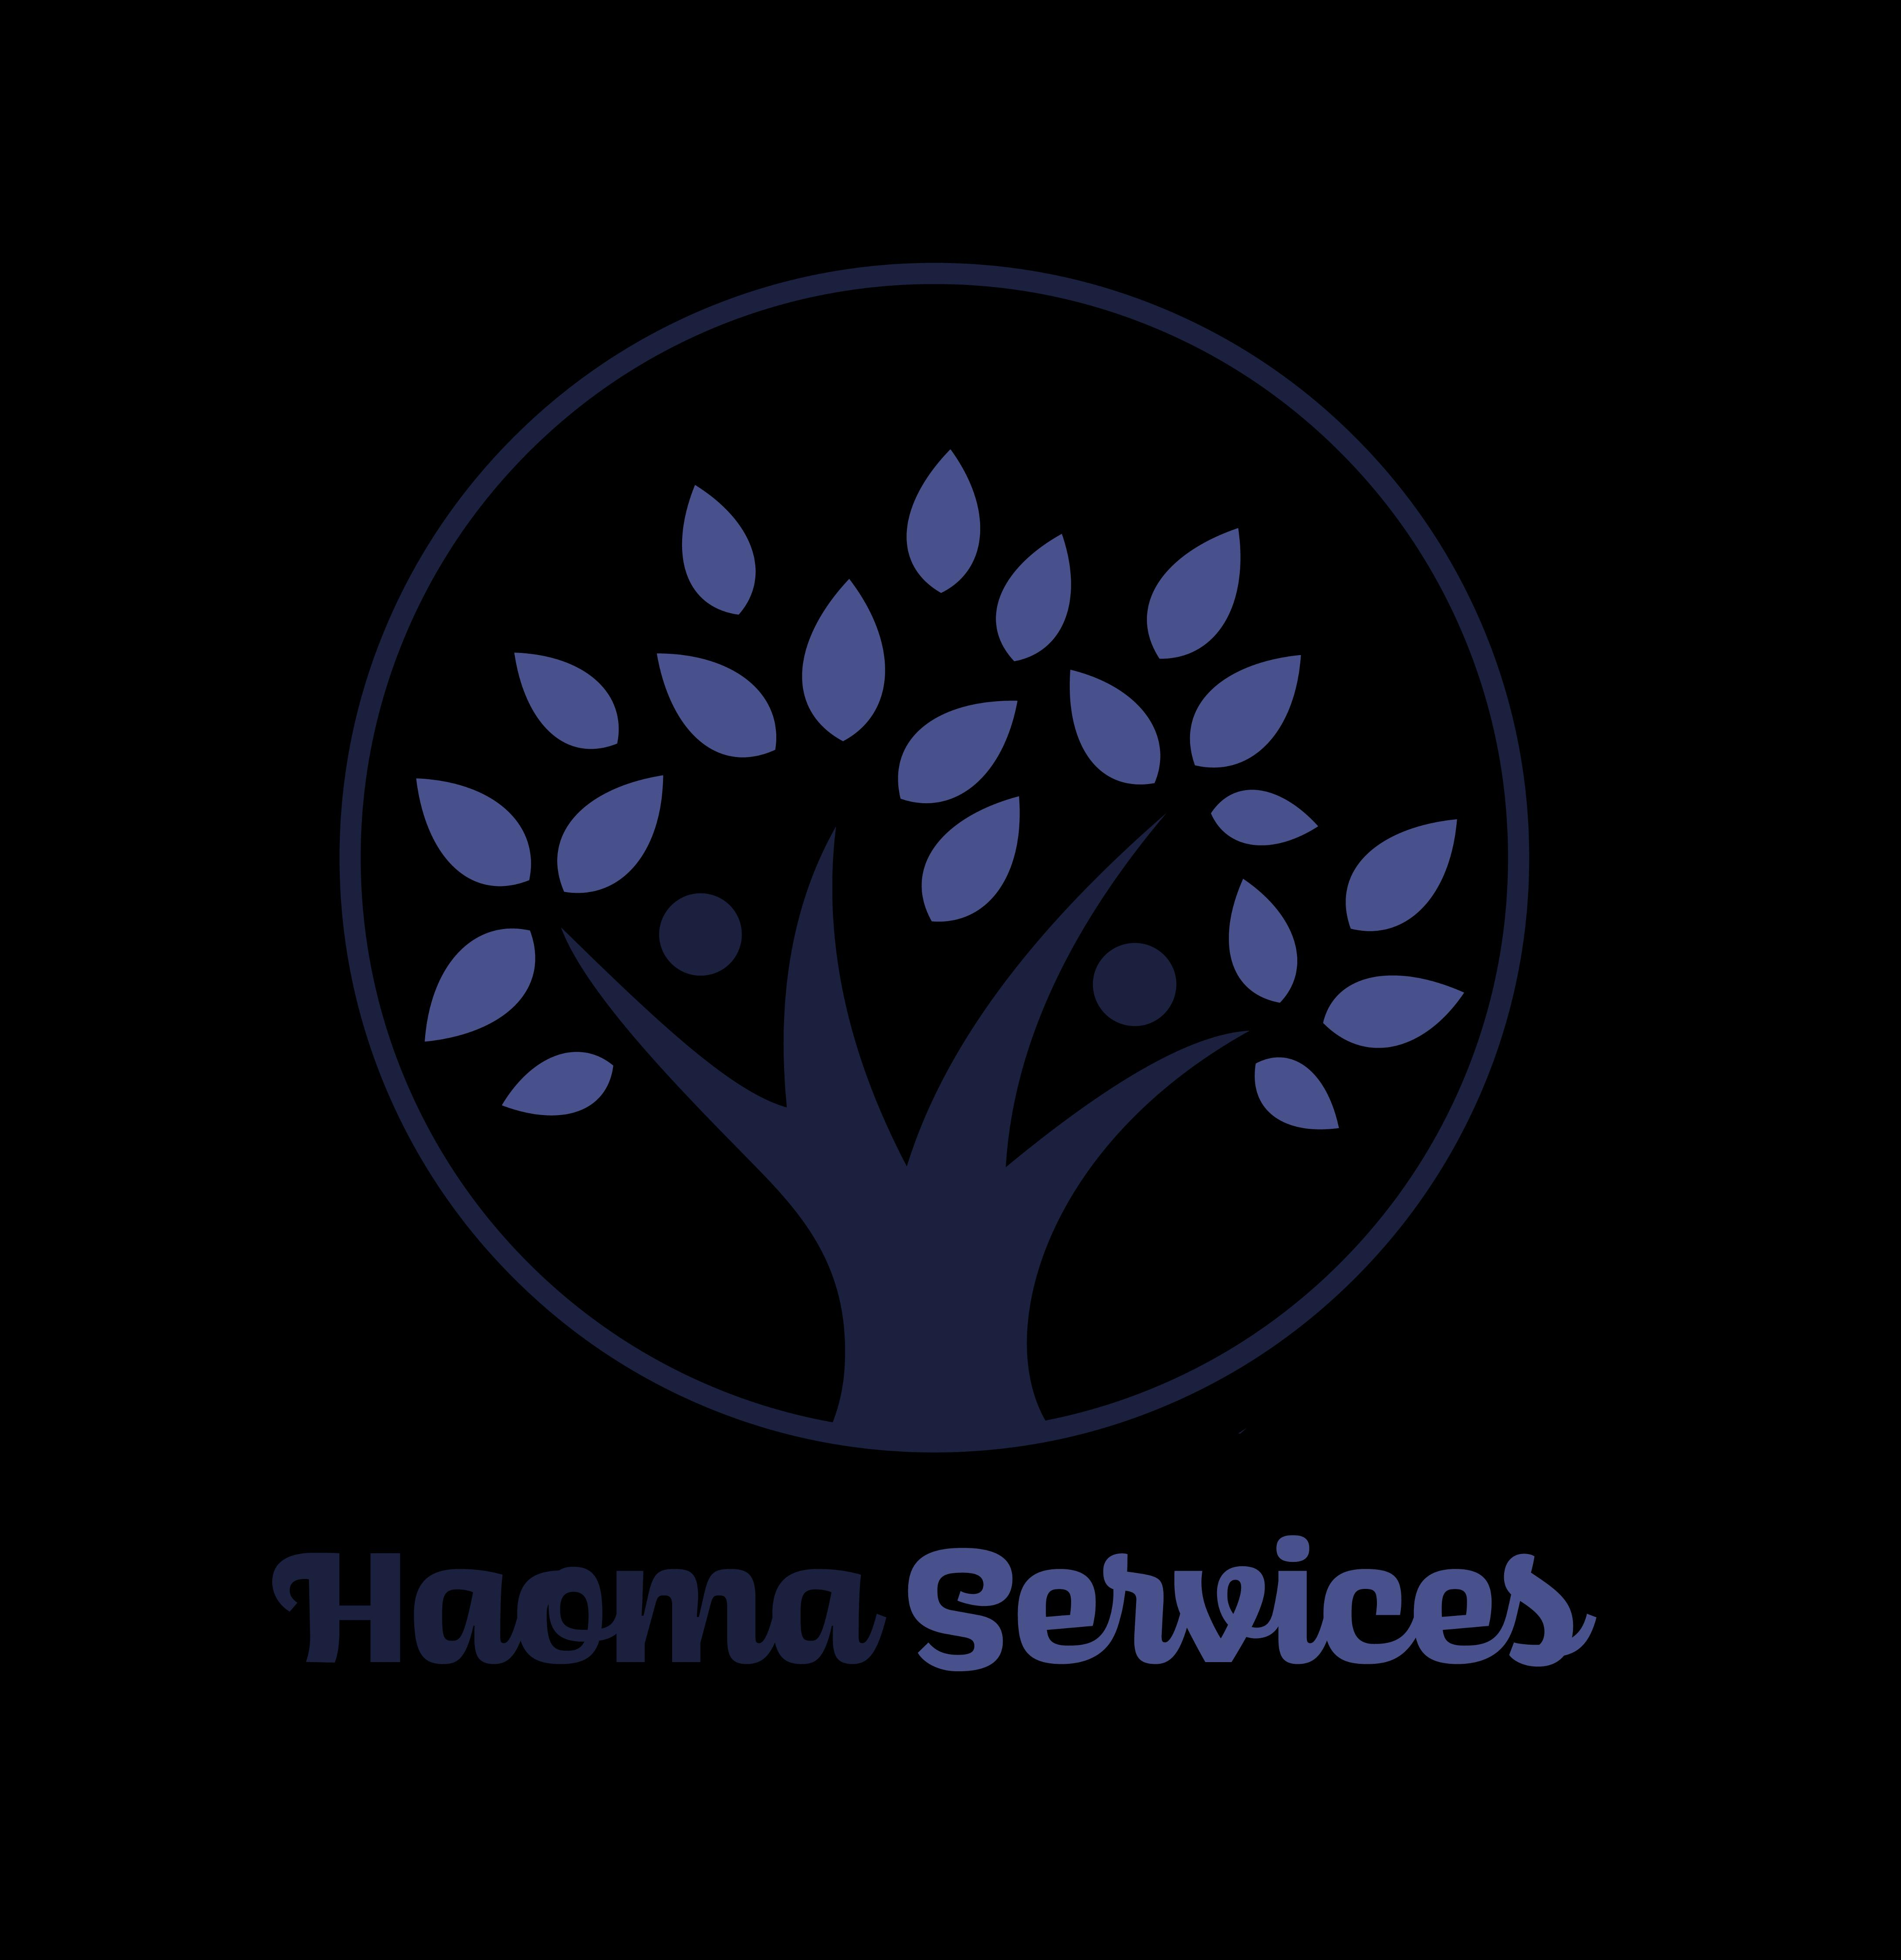 Haoma Services Montbéliard